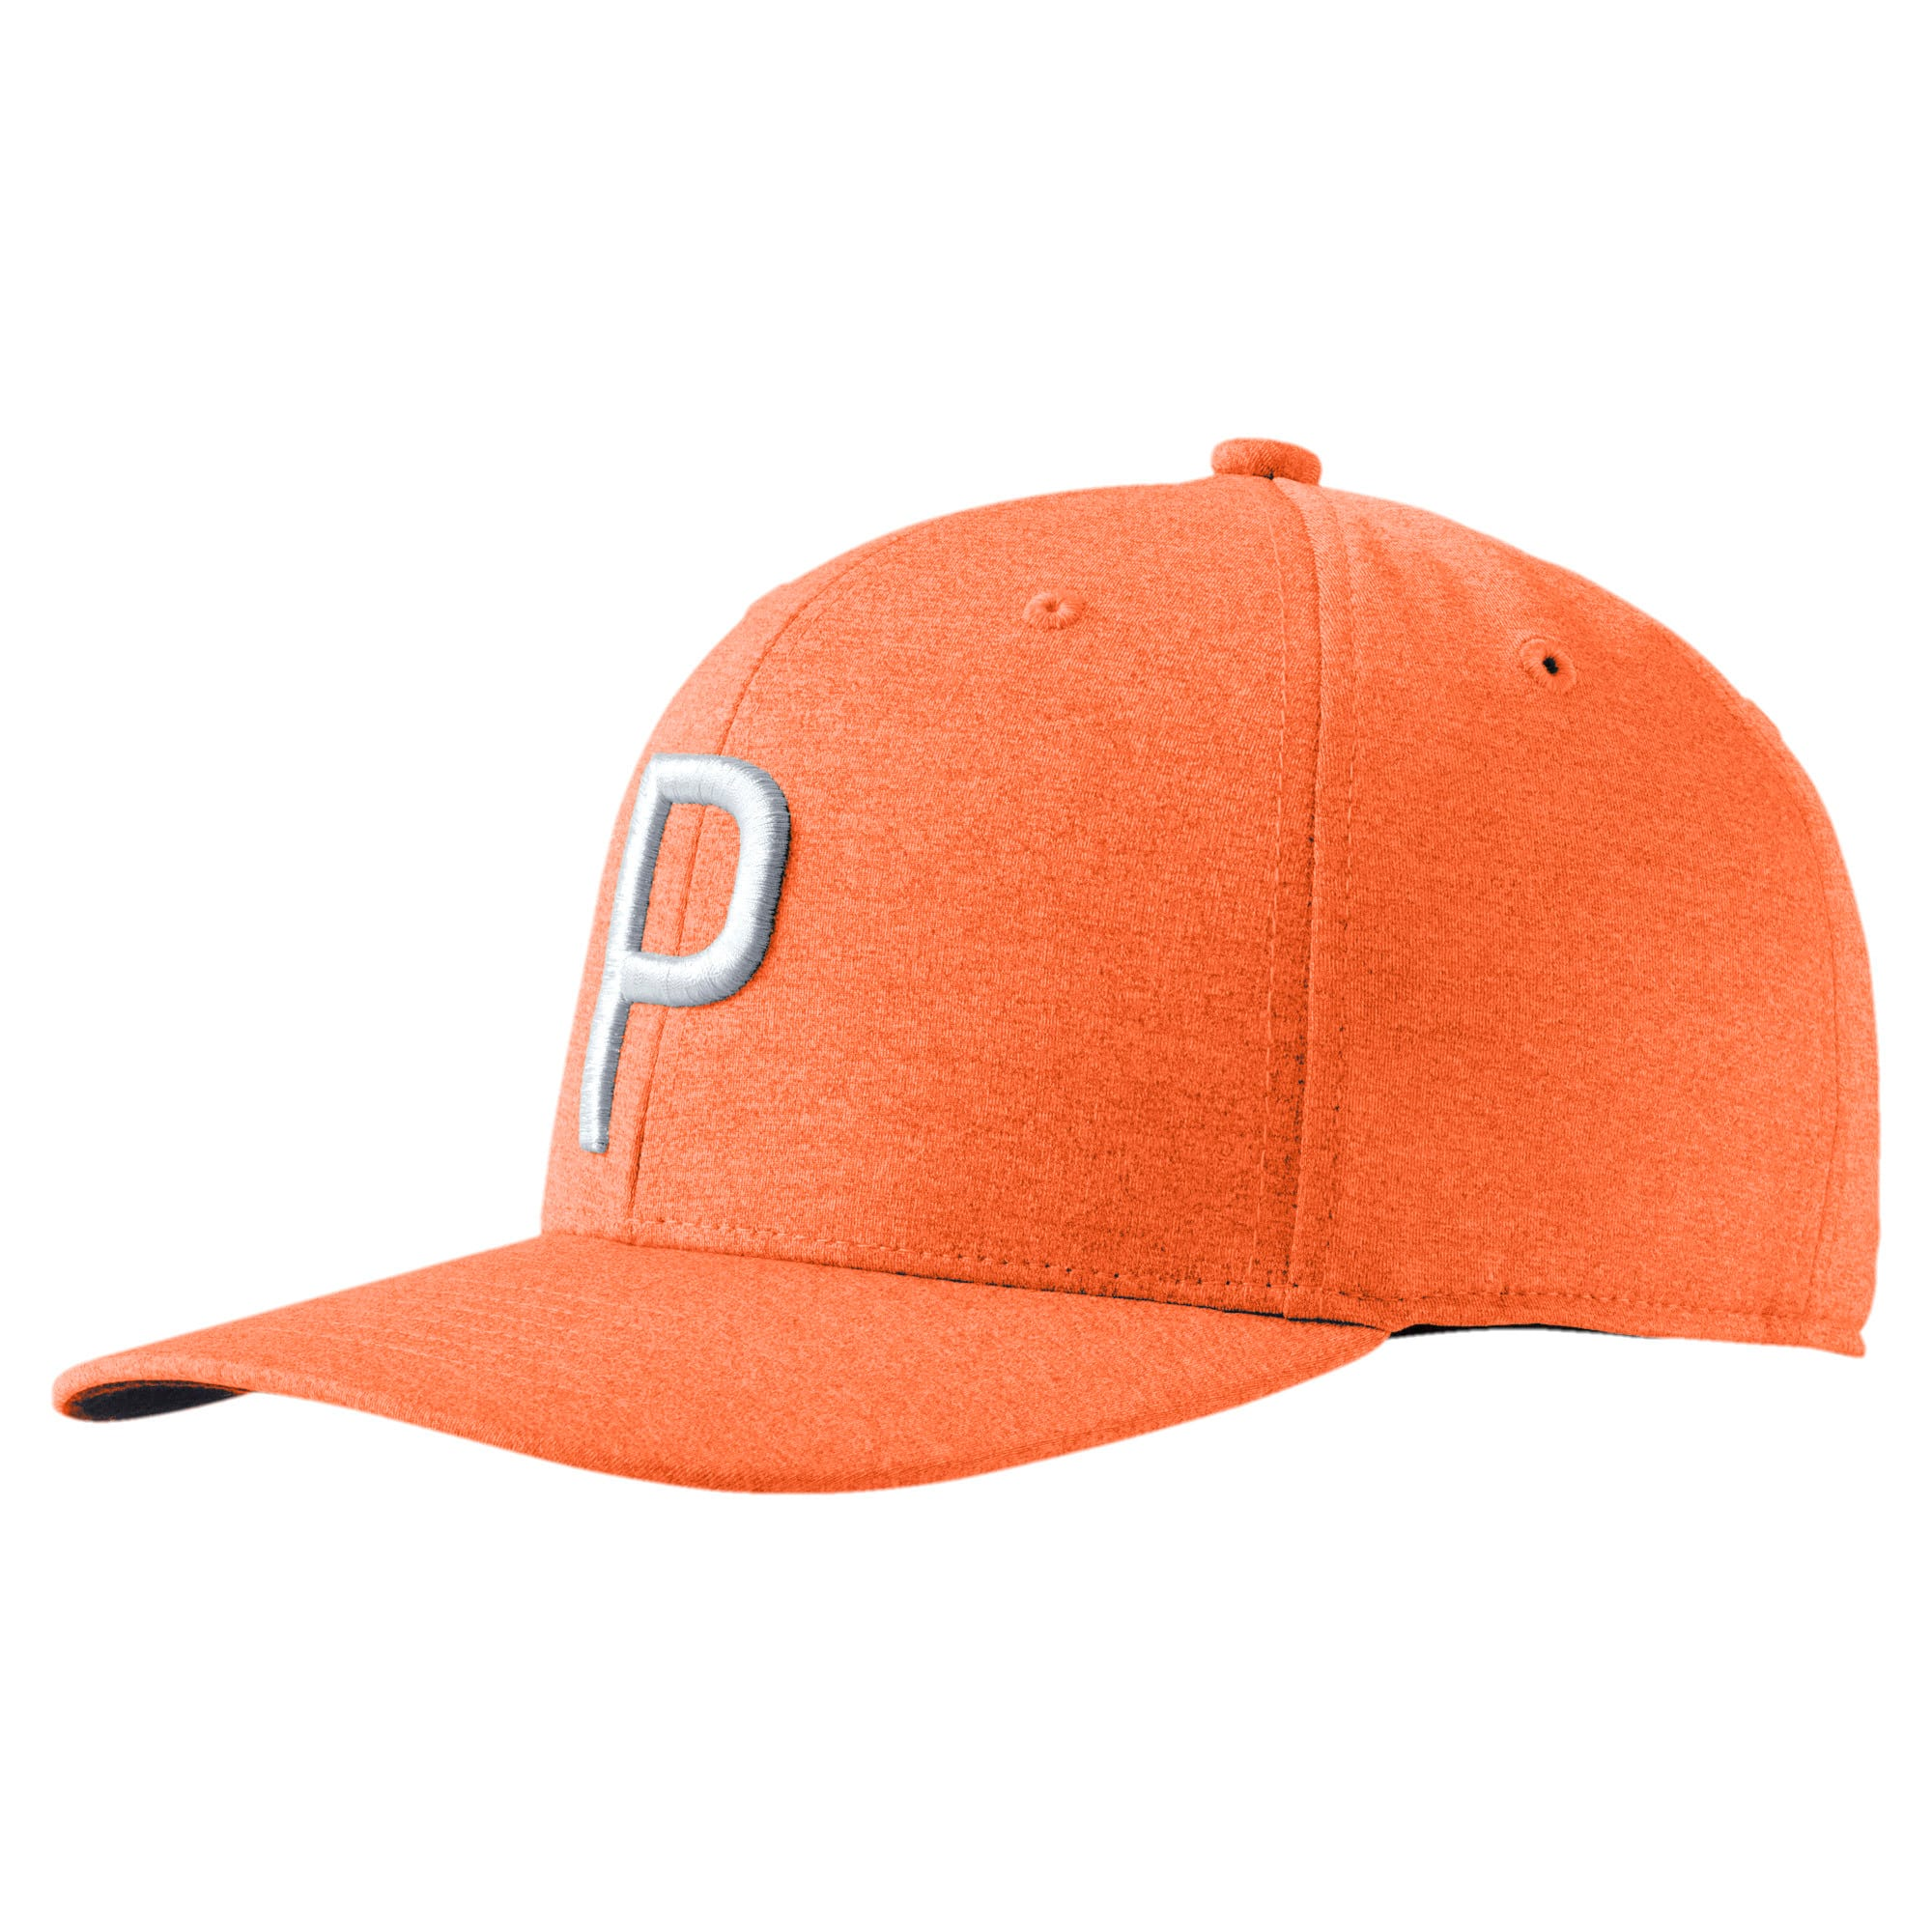 Thumbnail 1 of ゴルフ Pマークスナップバックキャップ, Vibrant Orange, medium-JPN